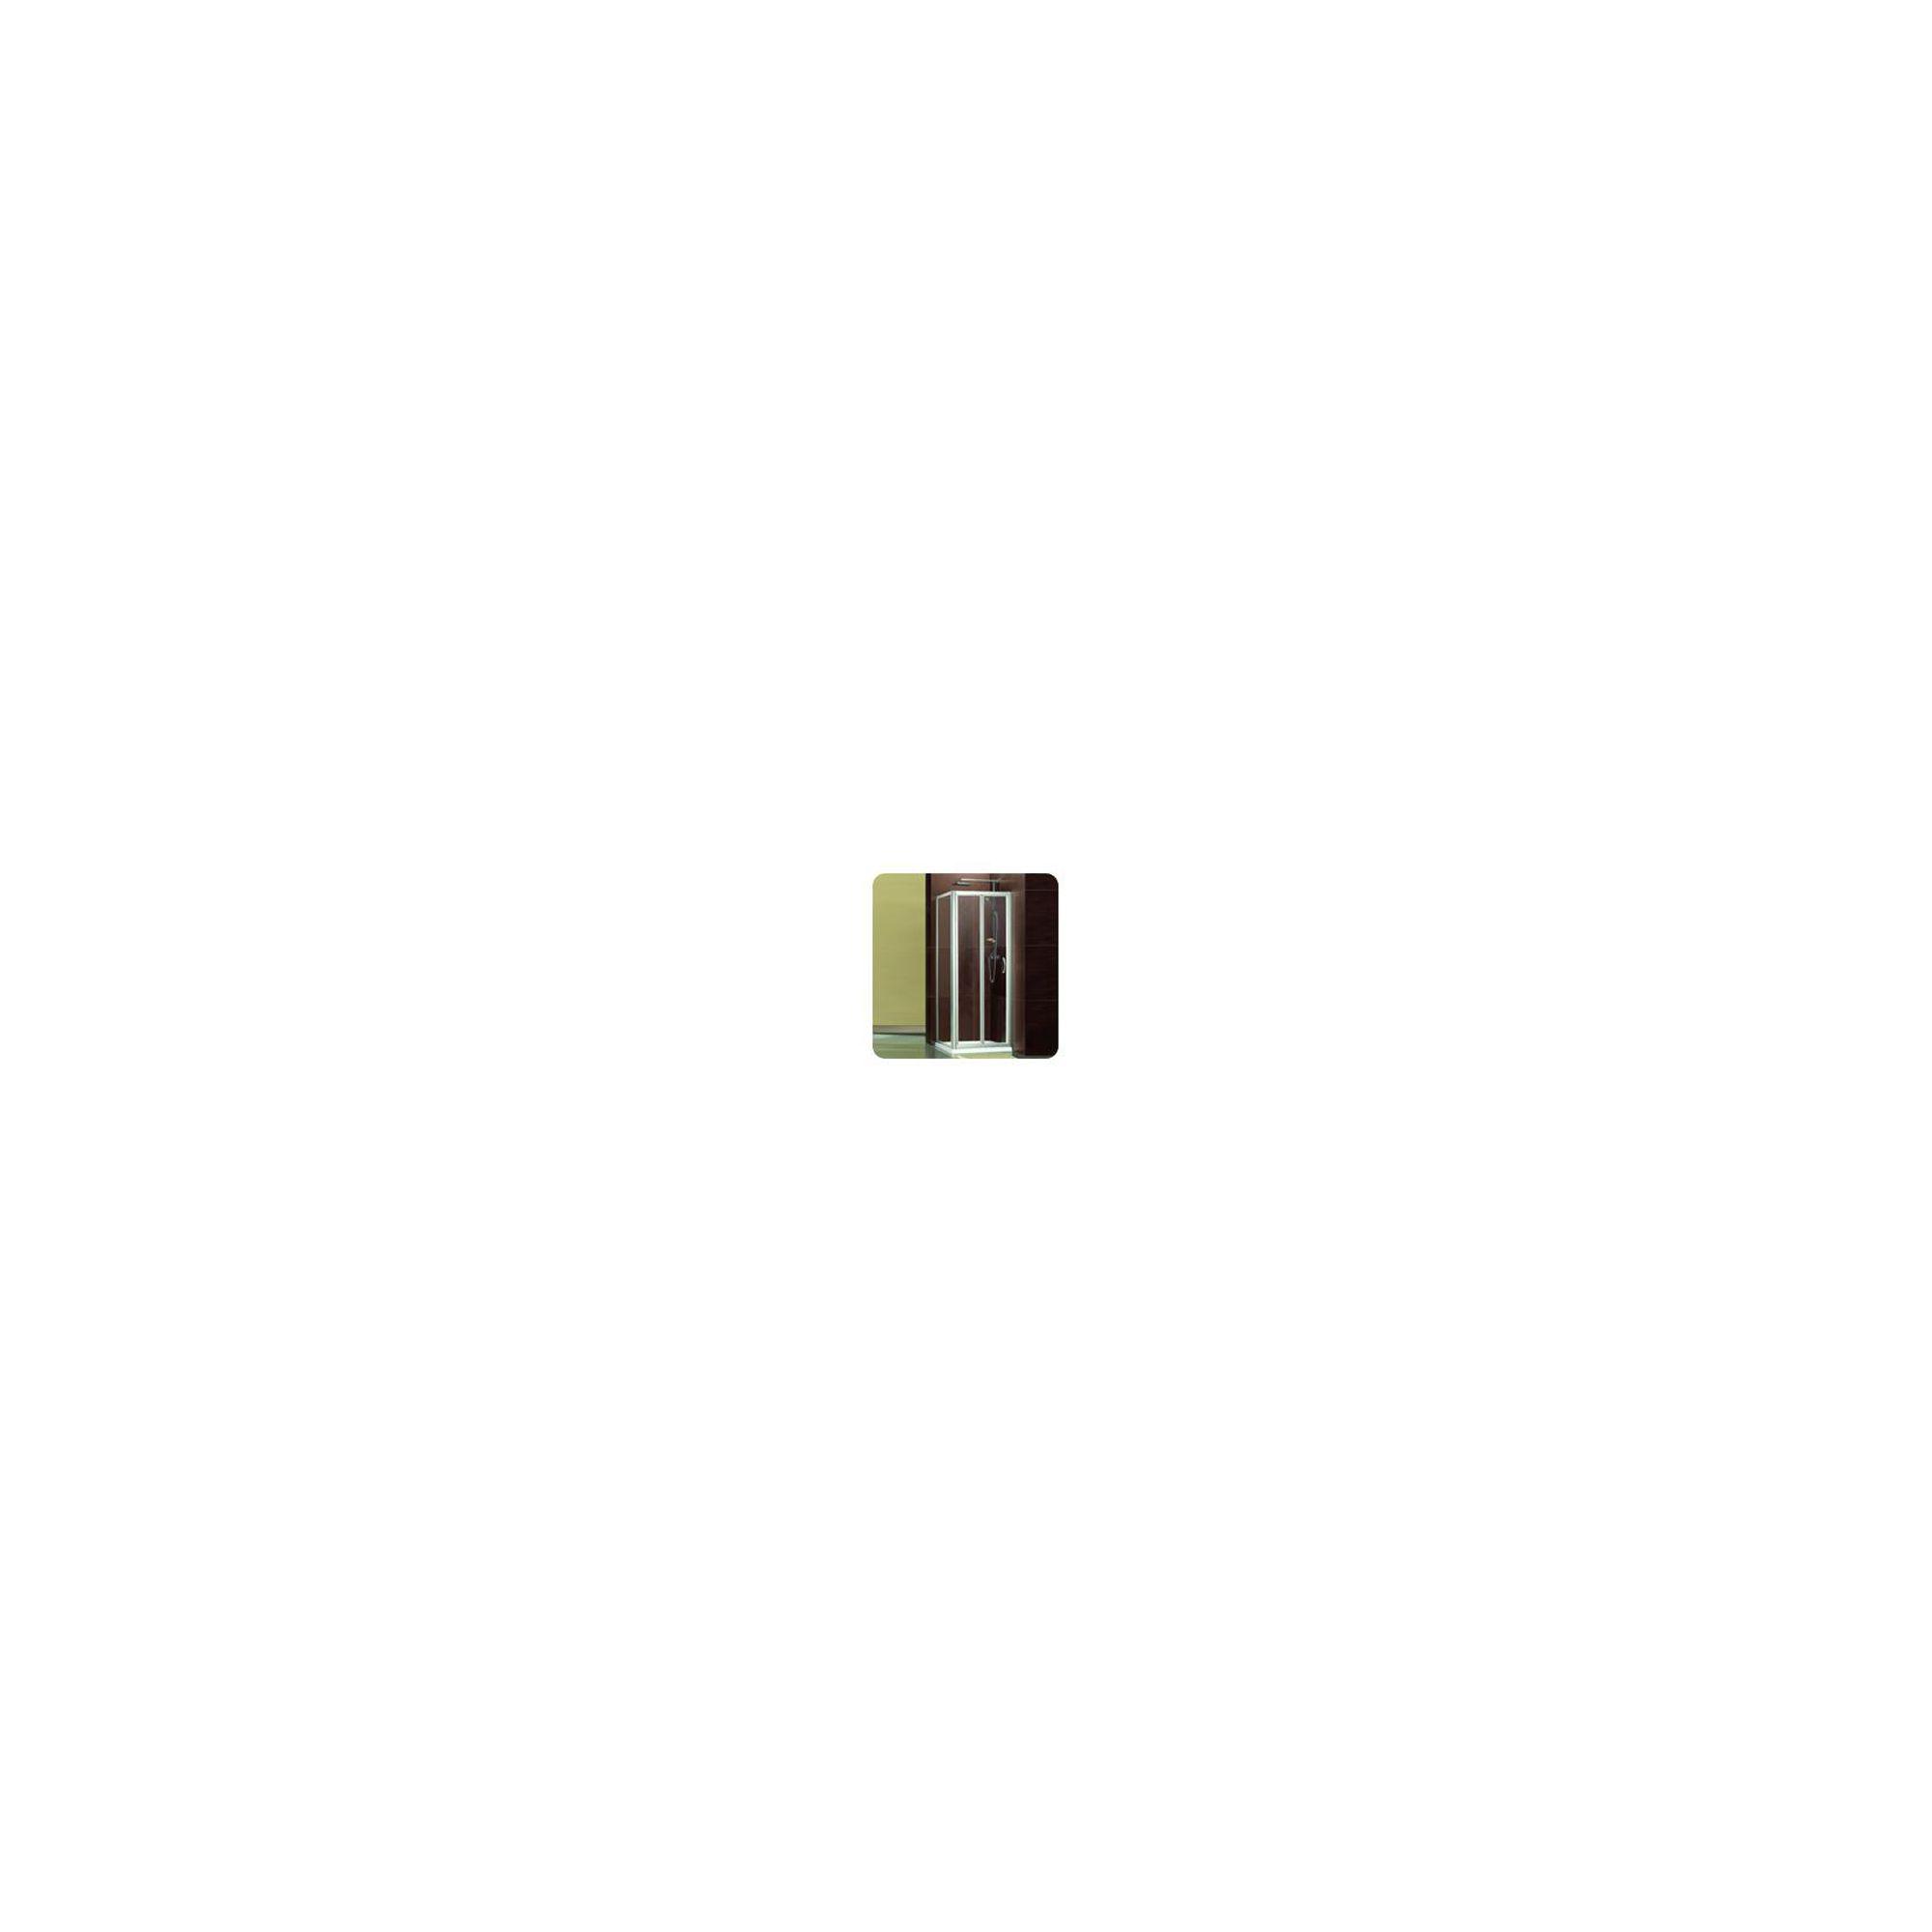 Balterley Framed Bi-Fold Shower Enclosure, 800mm x 800mm, Standard Tray, 6mm Glass at Tesco Direct